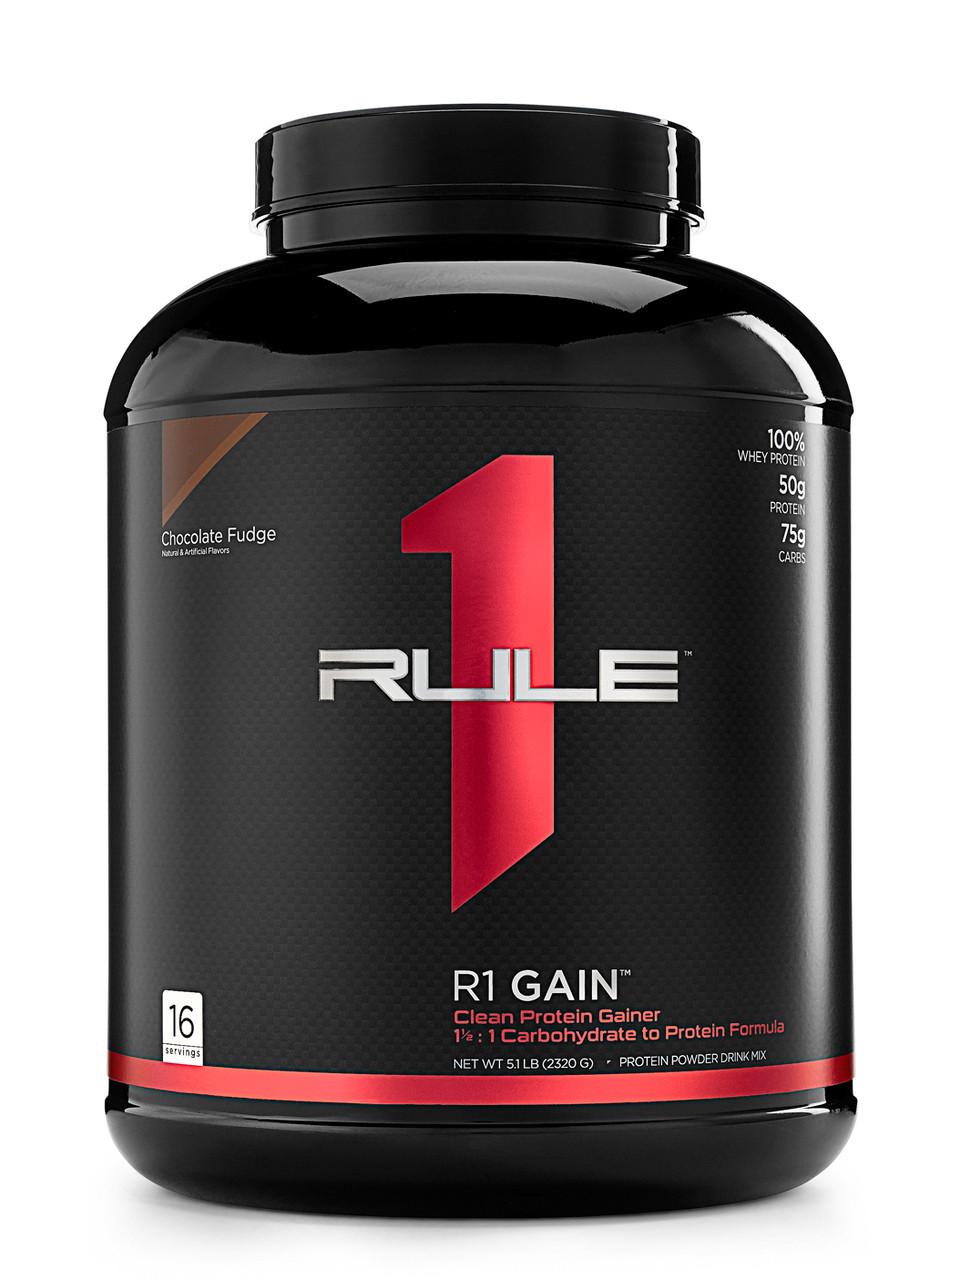 R1_Gain 2,27 кг - Chocolate Fudge